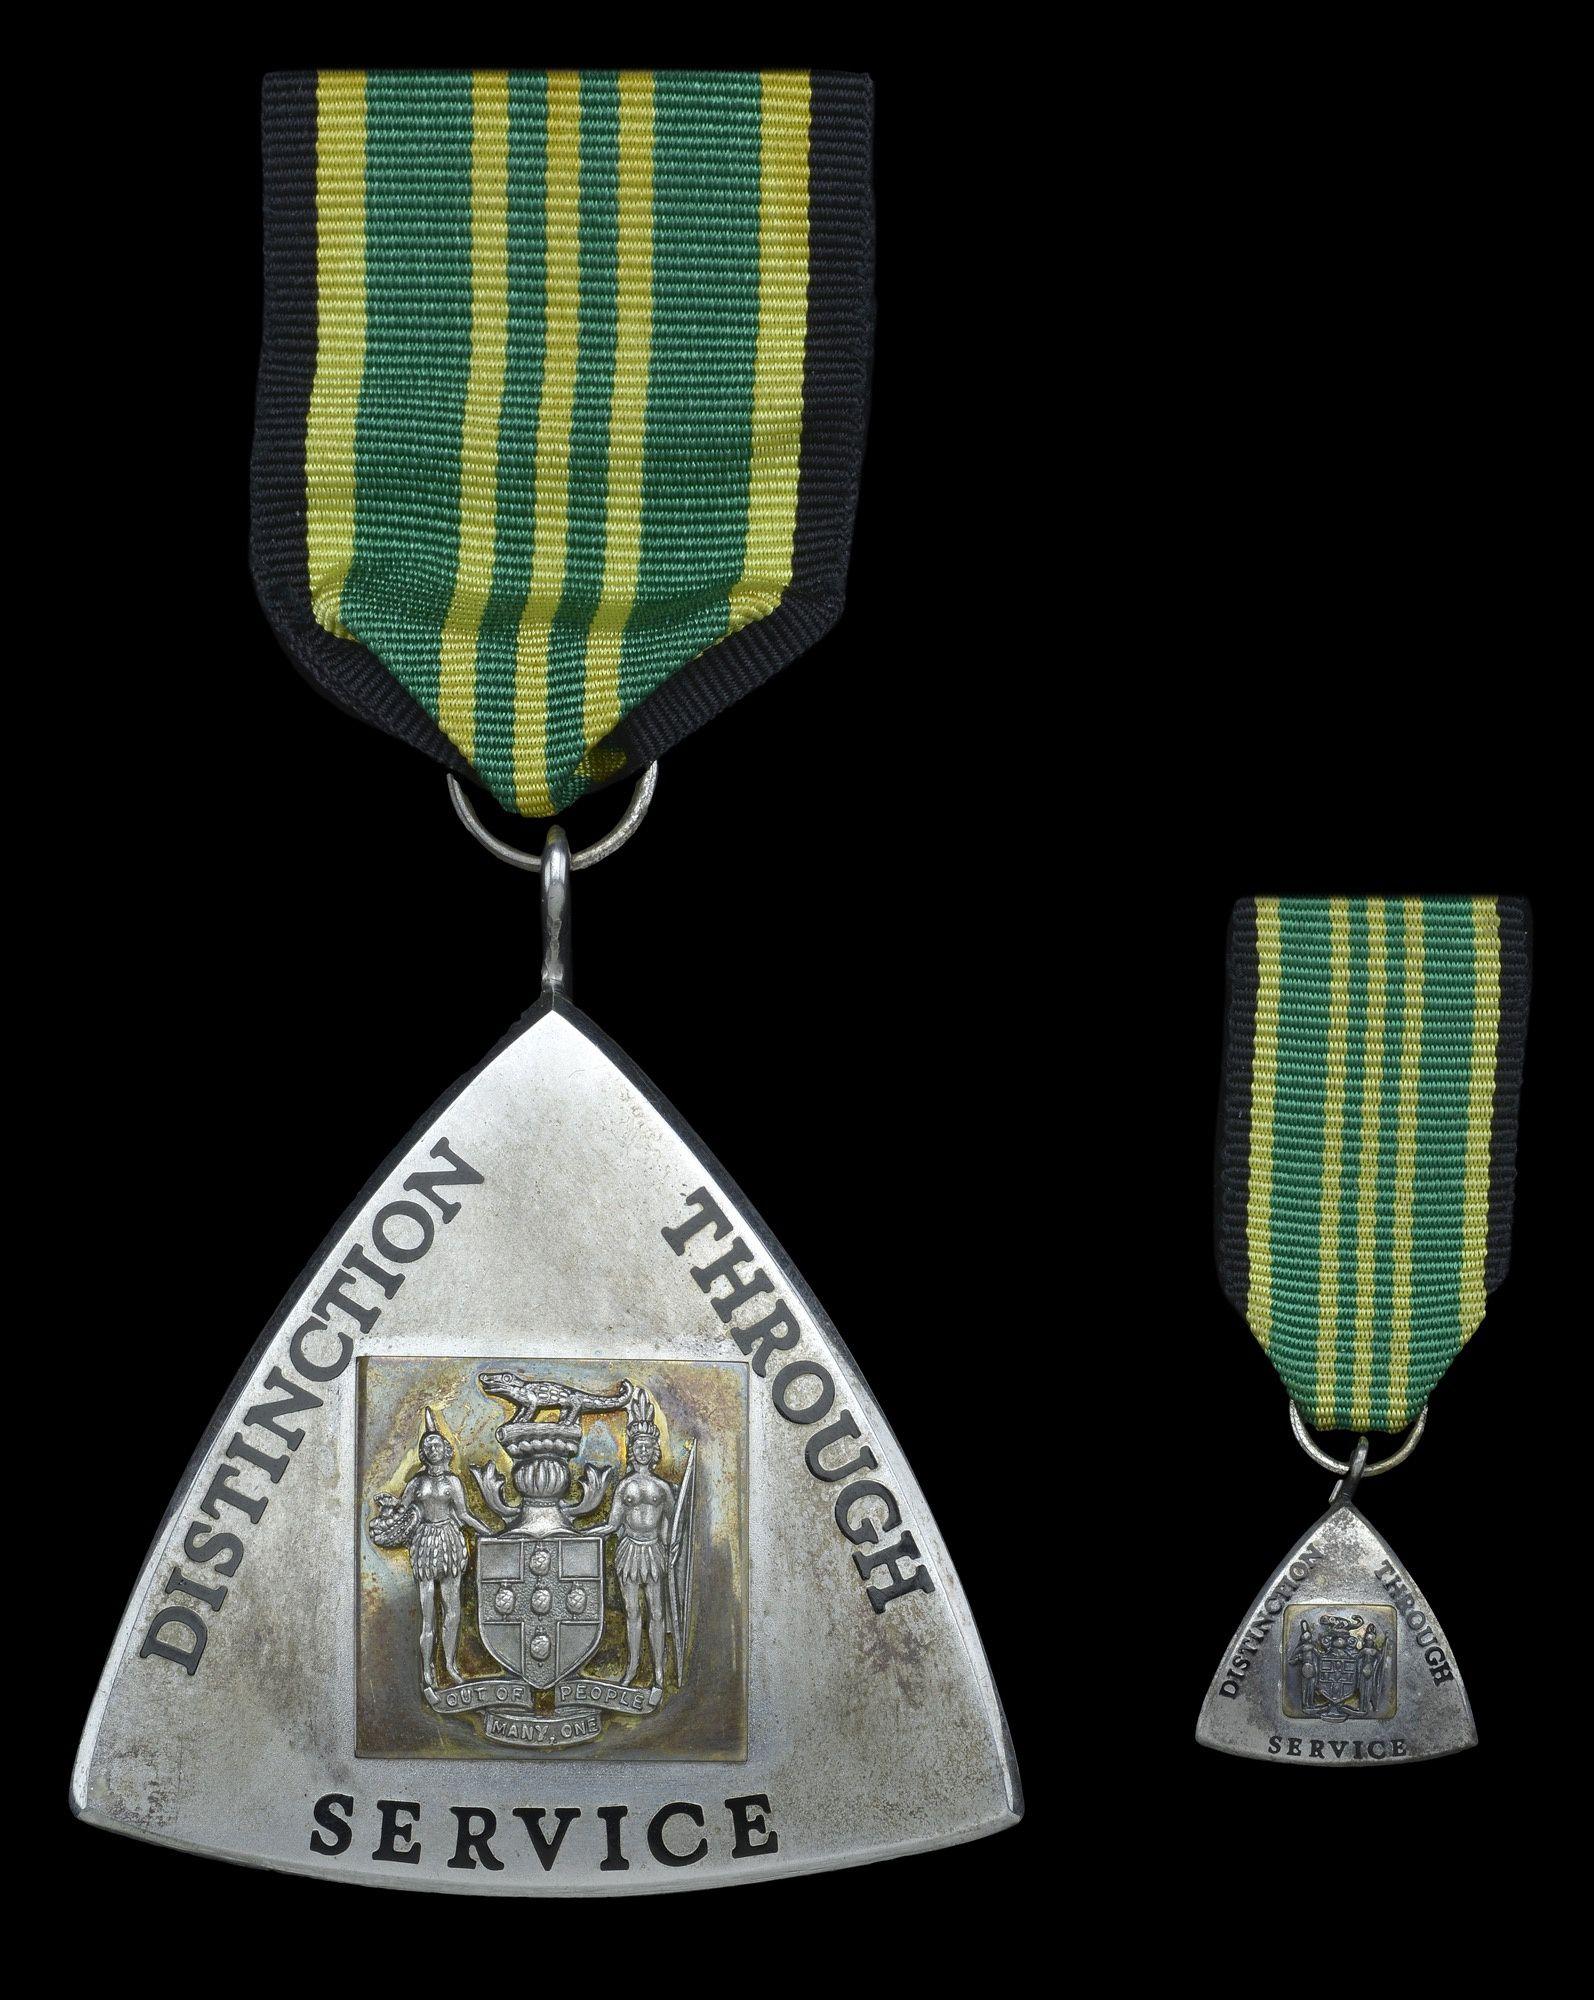 JAMAICA - Order of Distinction, Officer's breast badge